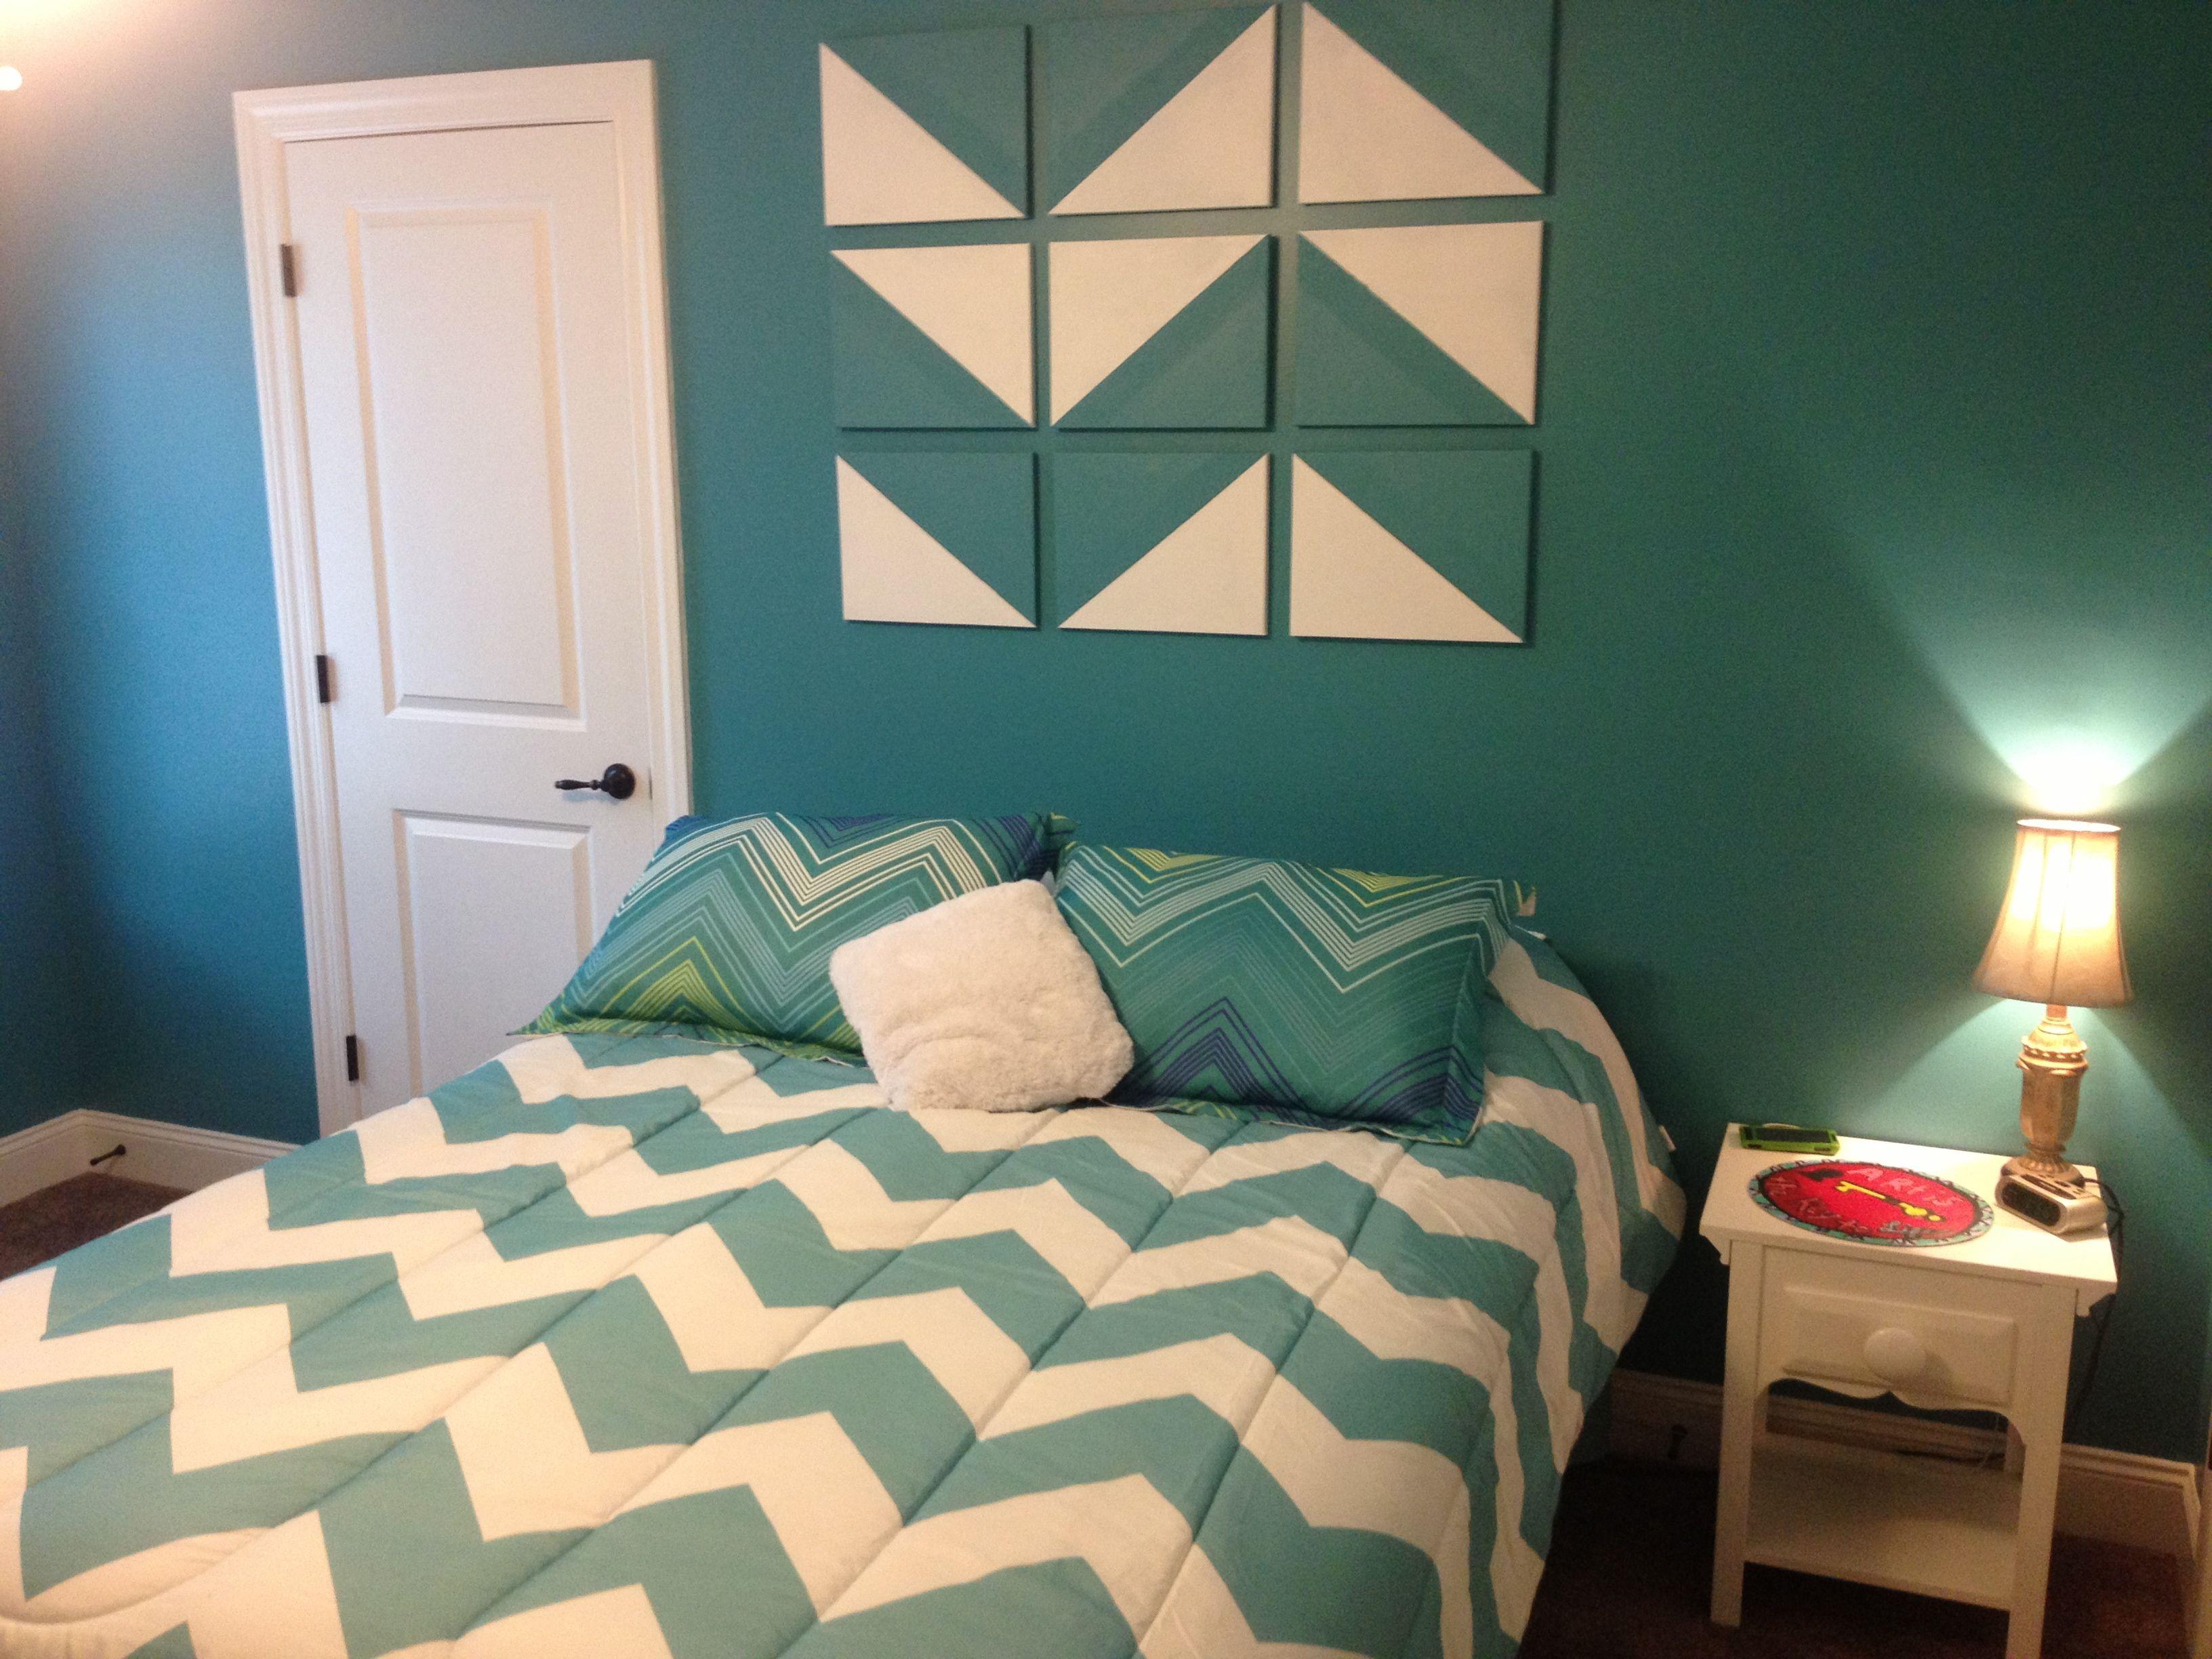 chevron bedroom bedroom ideas pinterest